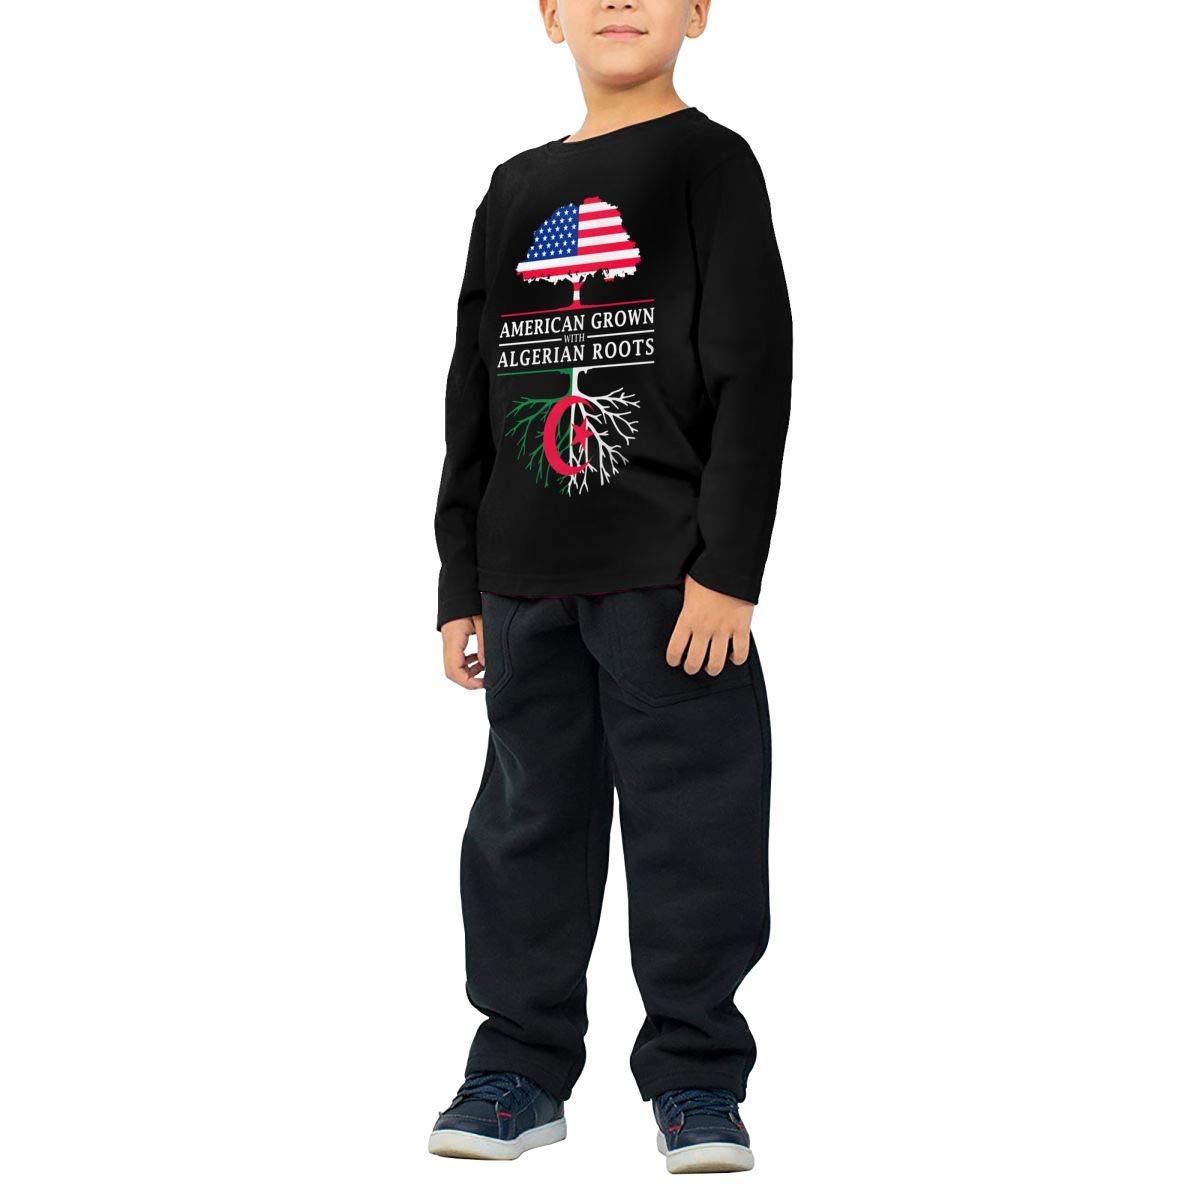 HADYKIDSLOVE American Grown with Algerian Roots Kids T-Shirt Long Sleeve Boys Girls T-Shirt